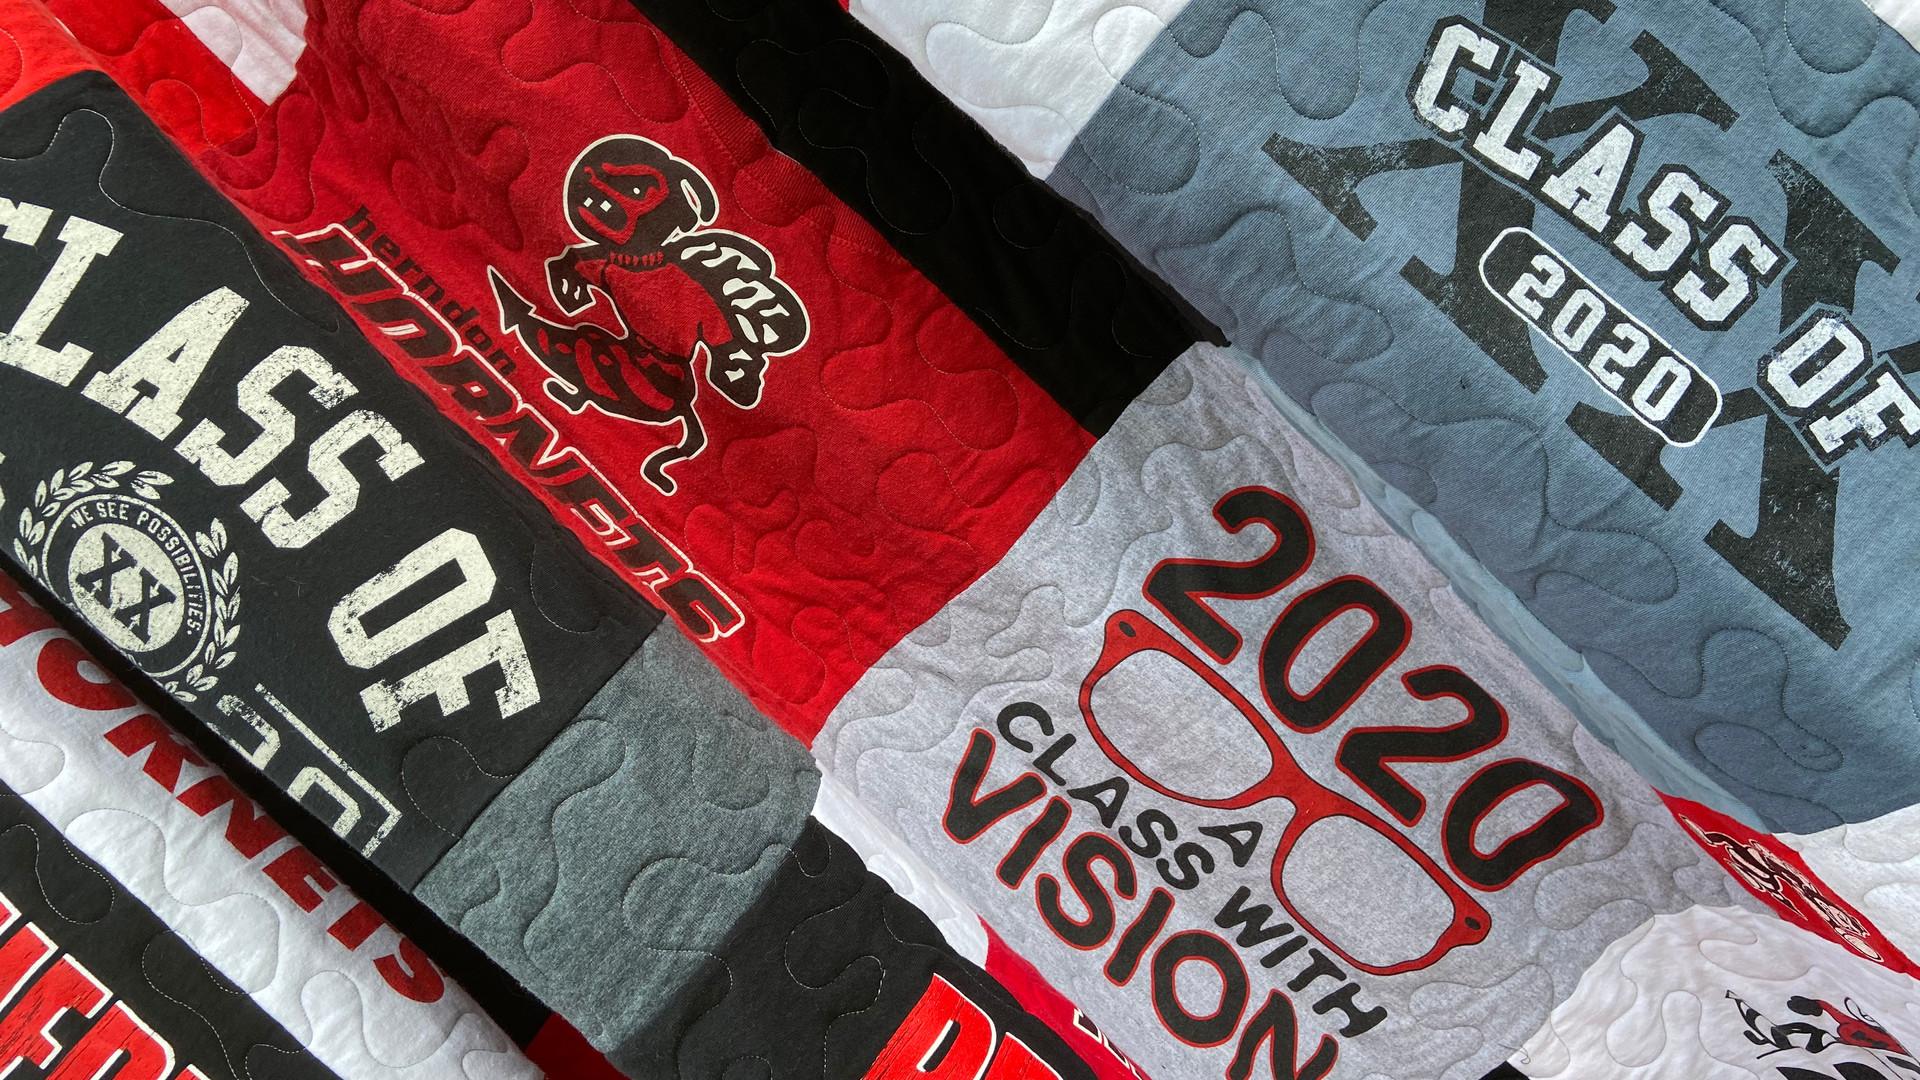 High school graduation quilt